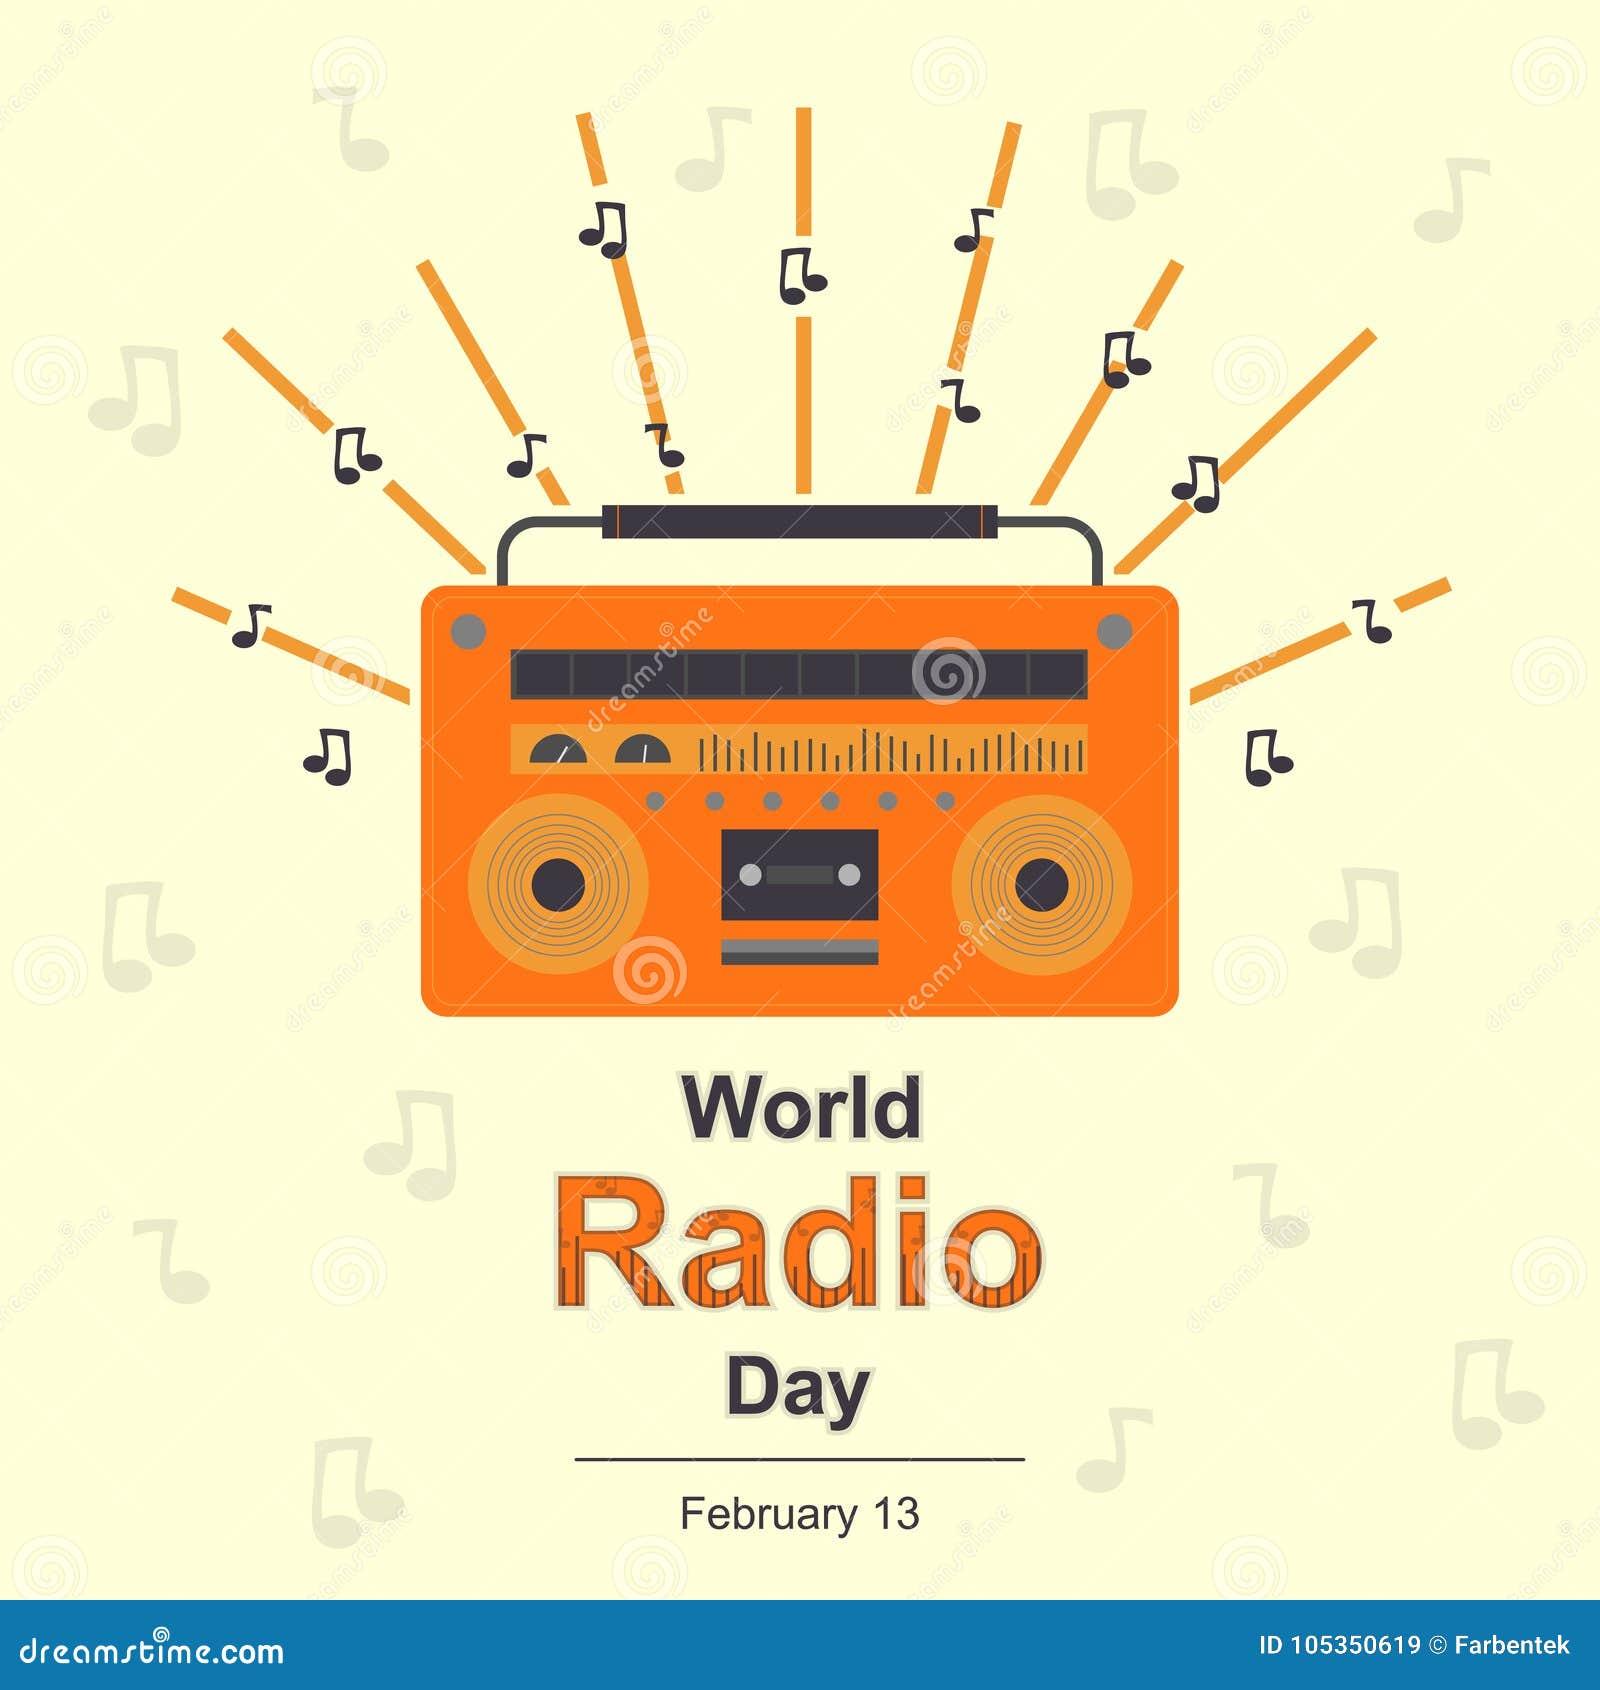 World Radio Day, 13 February.